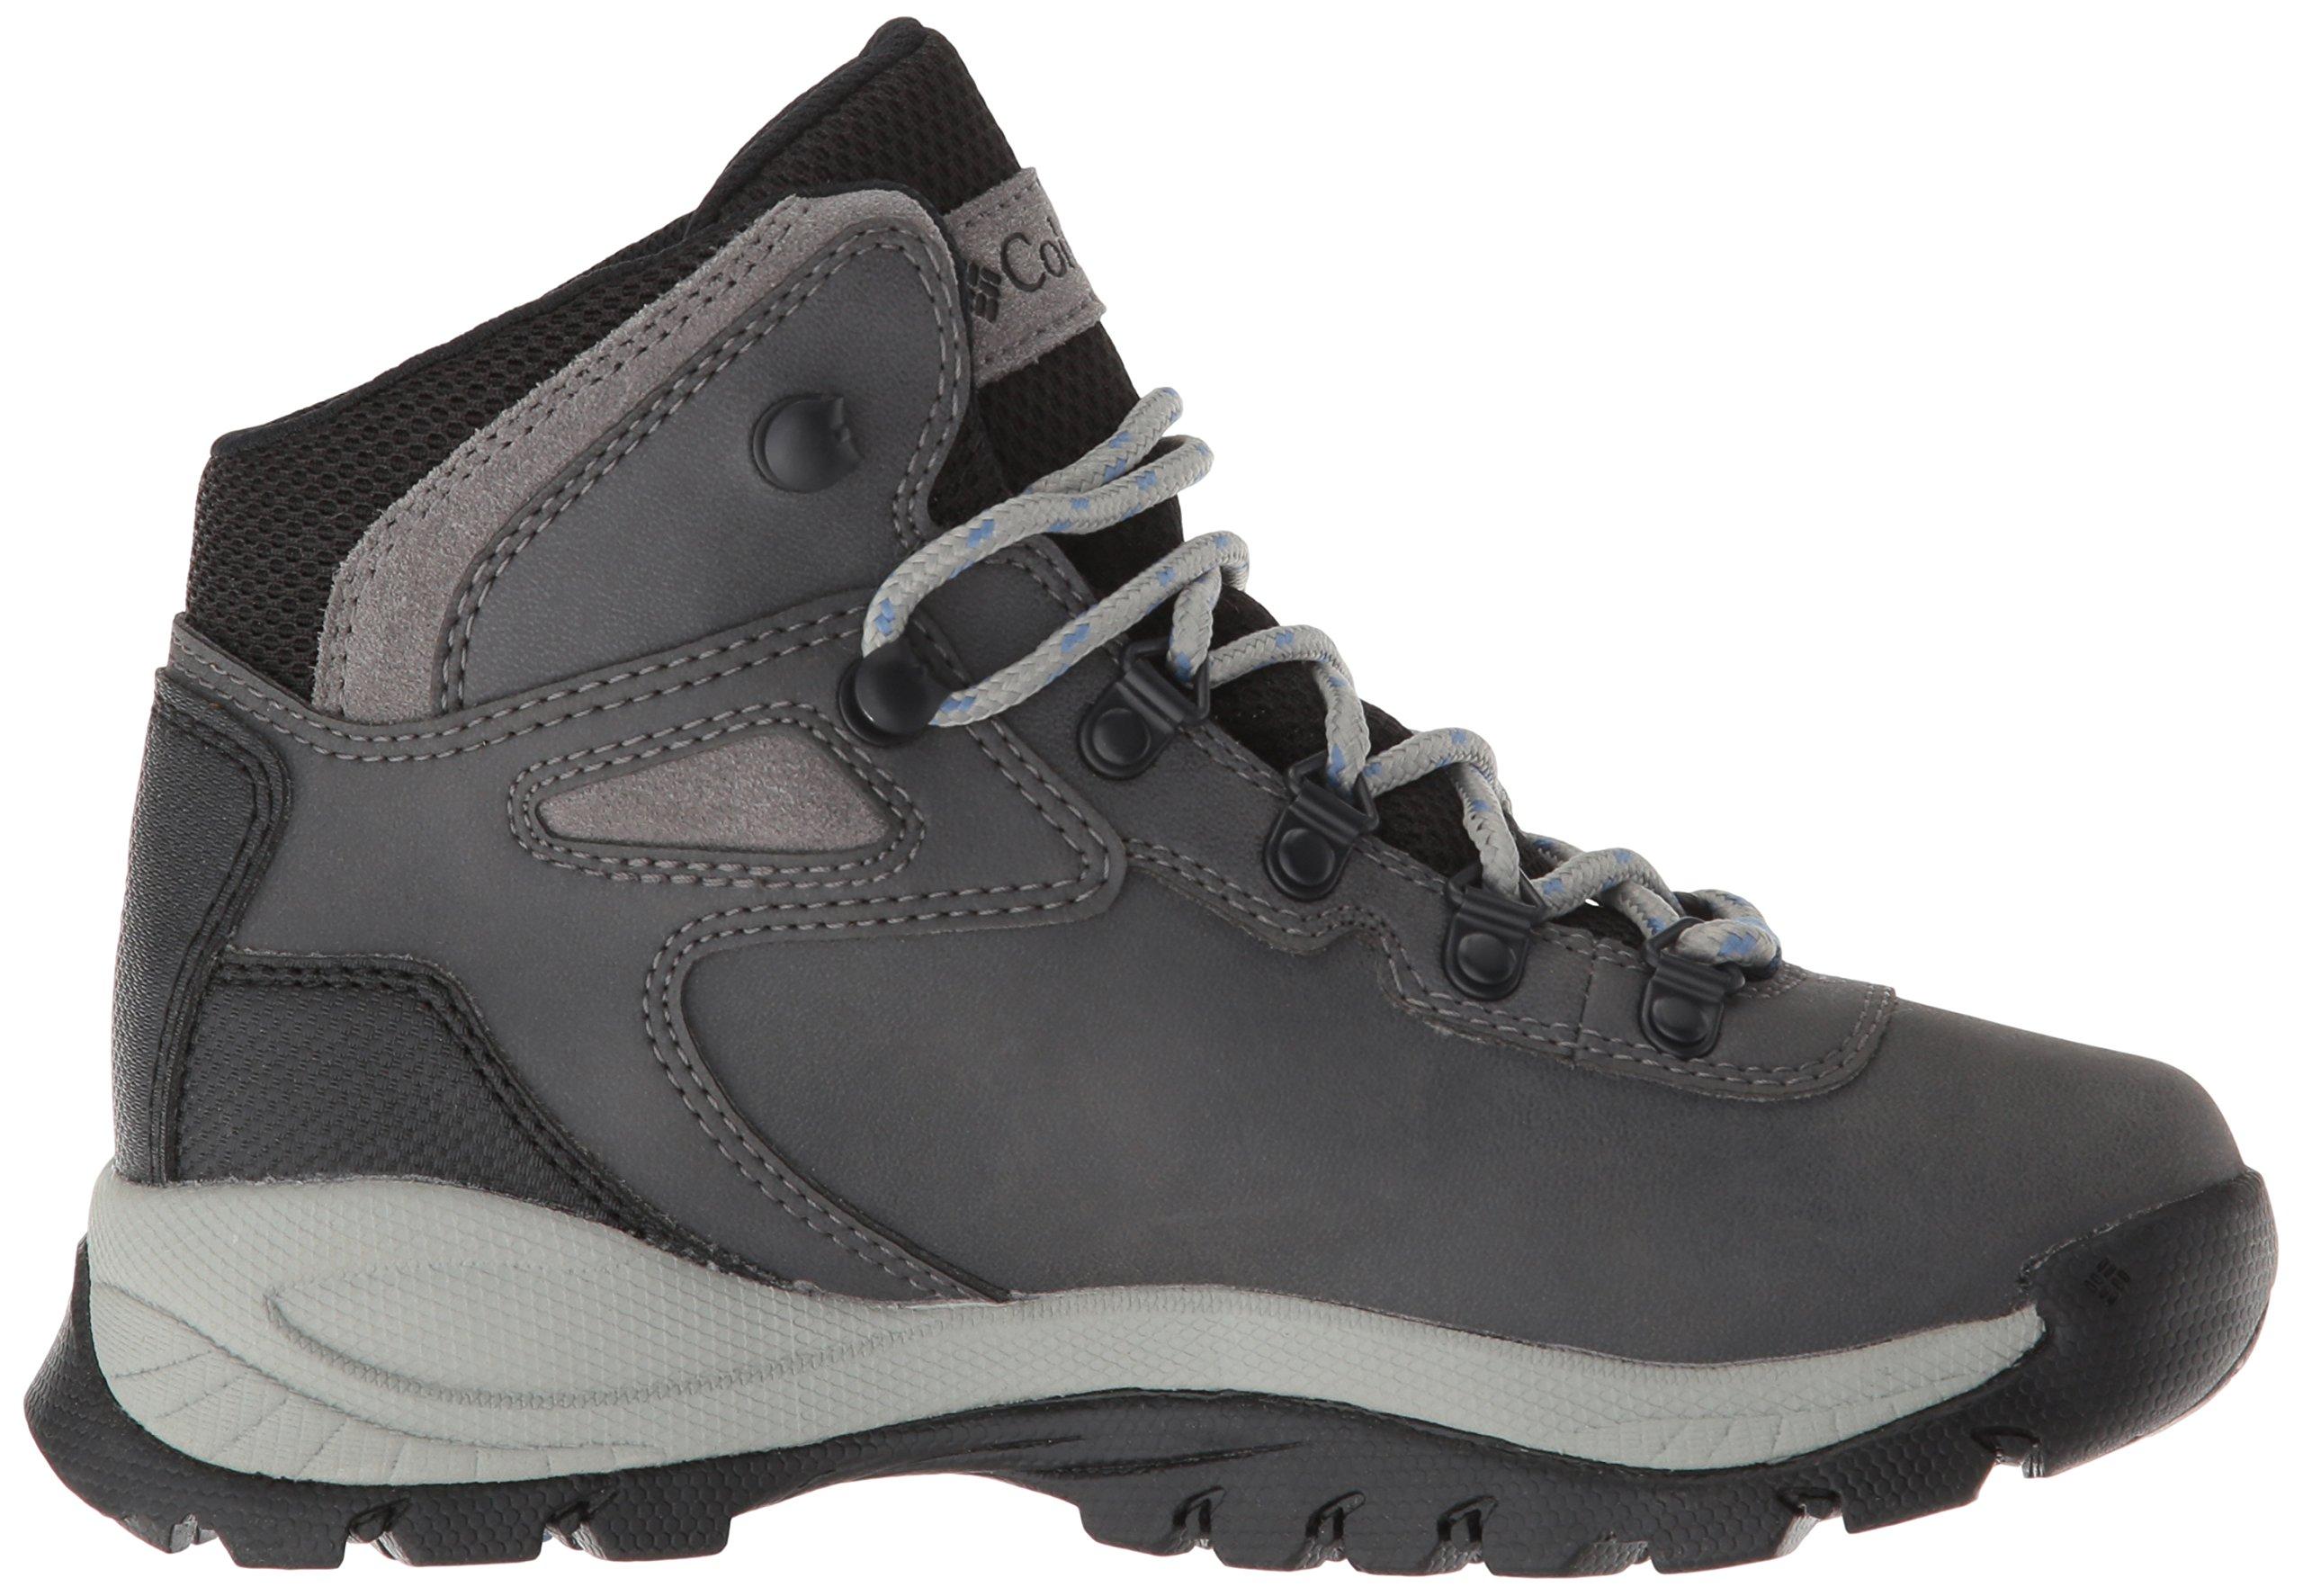 Women's Newton Ridge Plus Hiking Boot